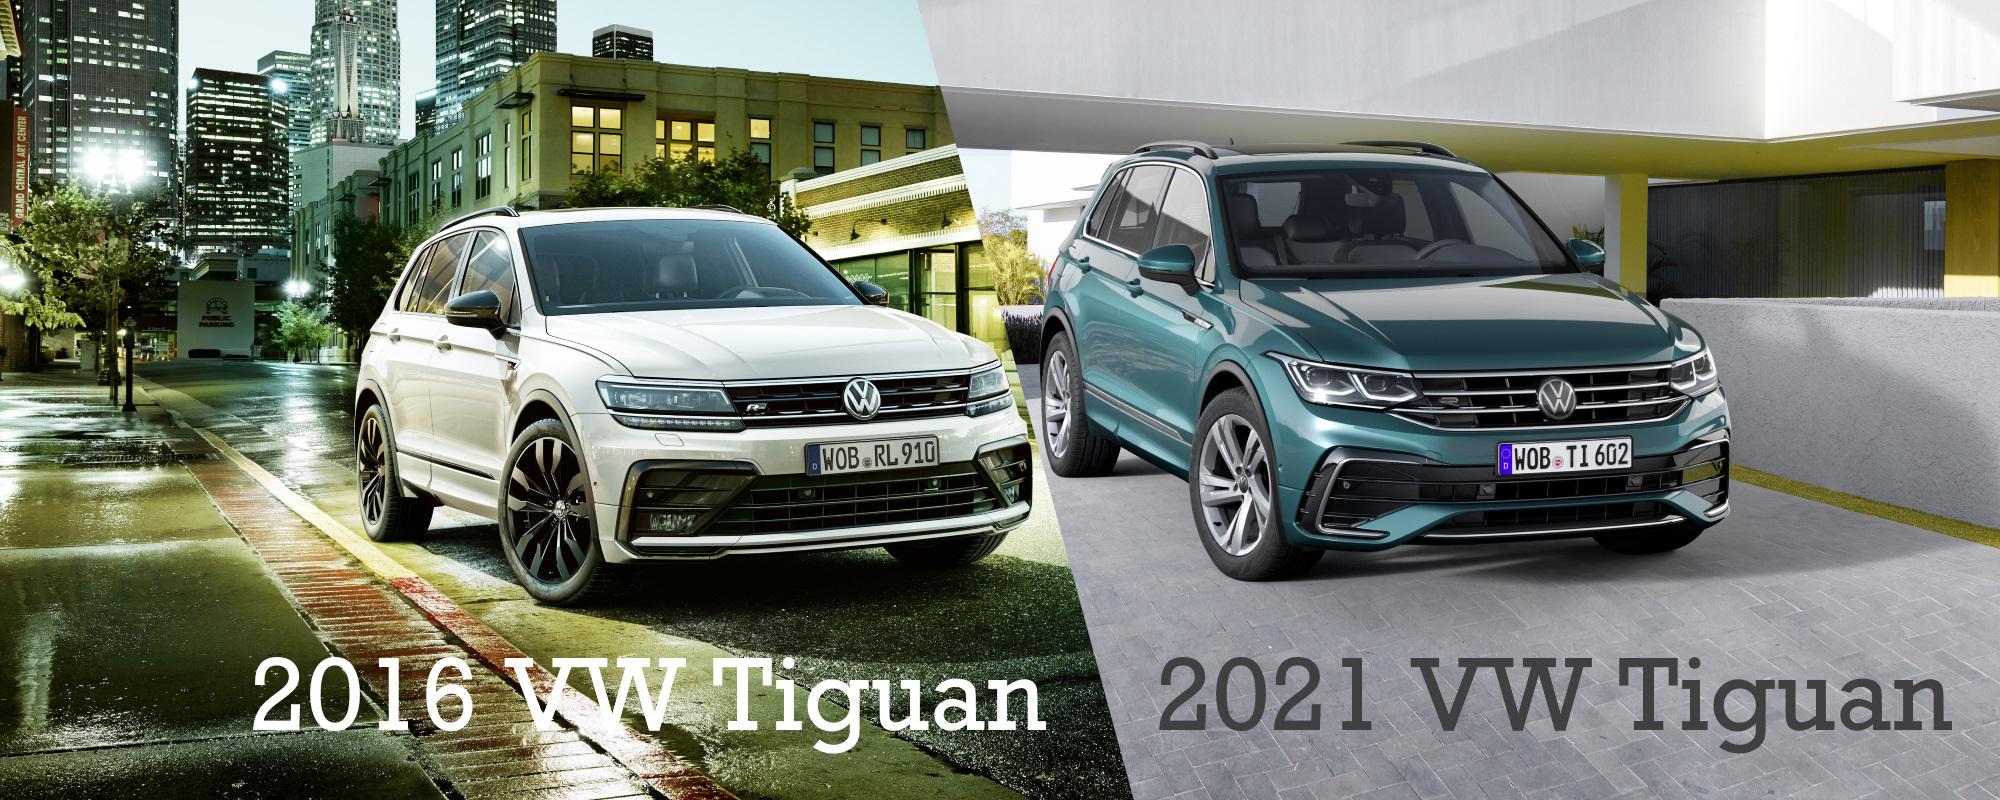 VERGLEICH: 2016 vs. 2021 VW Tiguan - autofilou